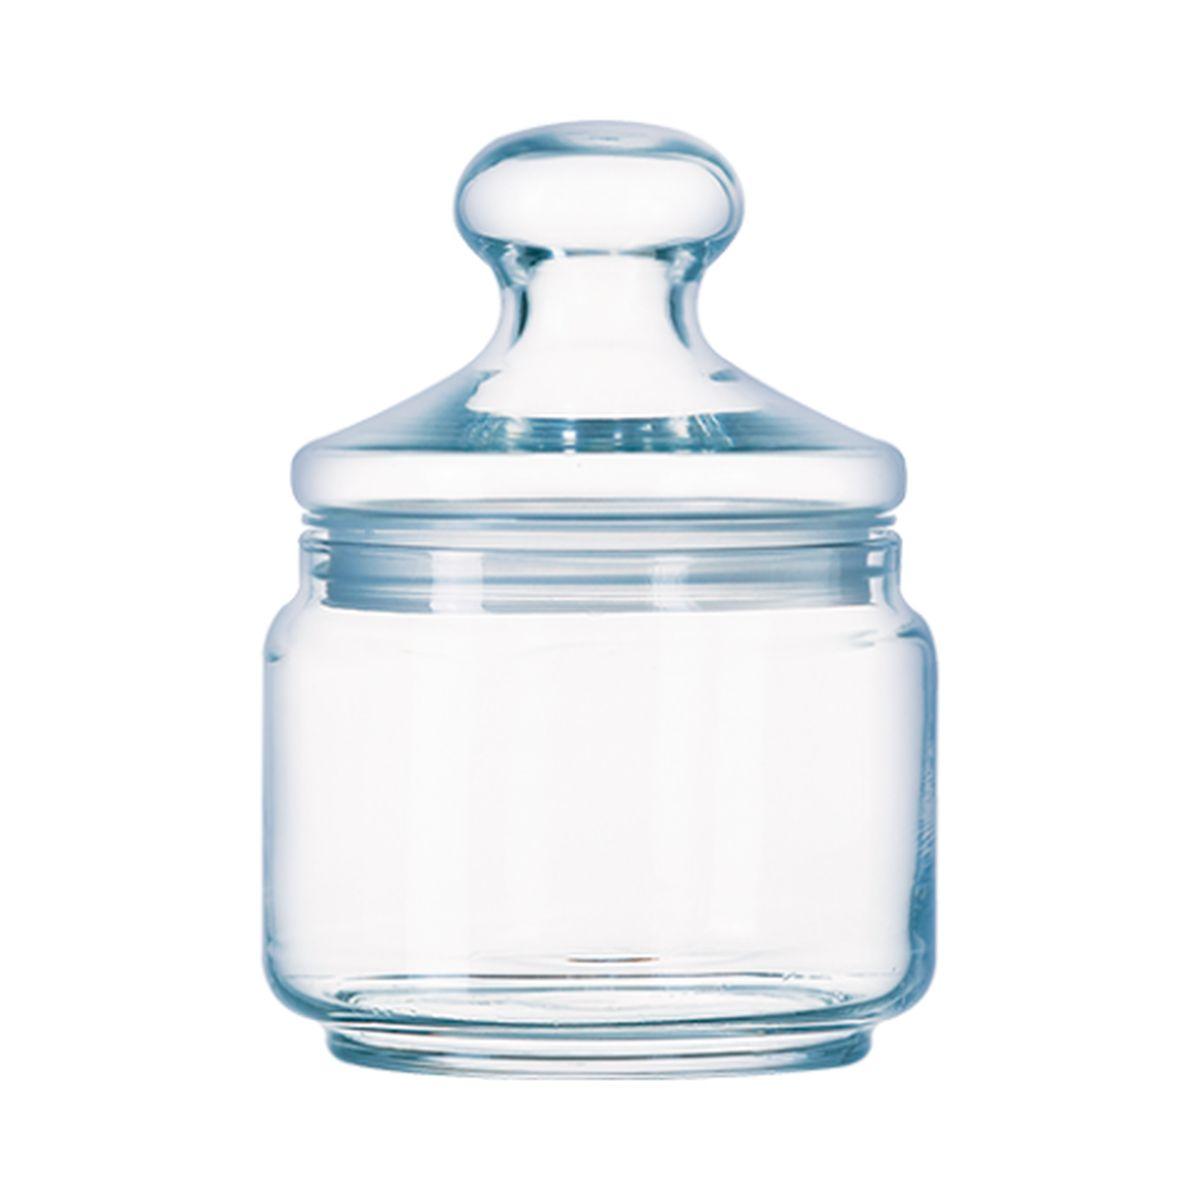 Bonbonnière en verre 0,5L 10cmx10cmx14.5cm - Luminarc